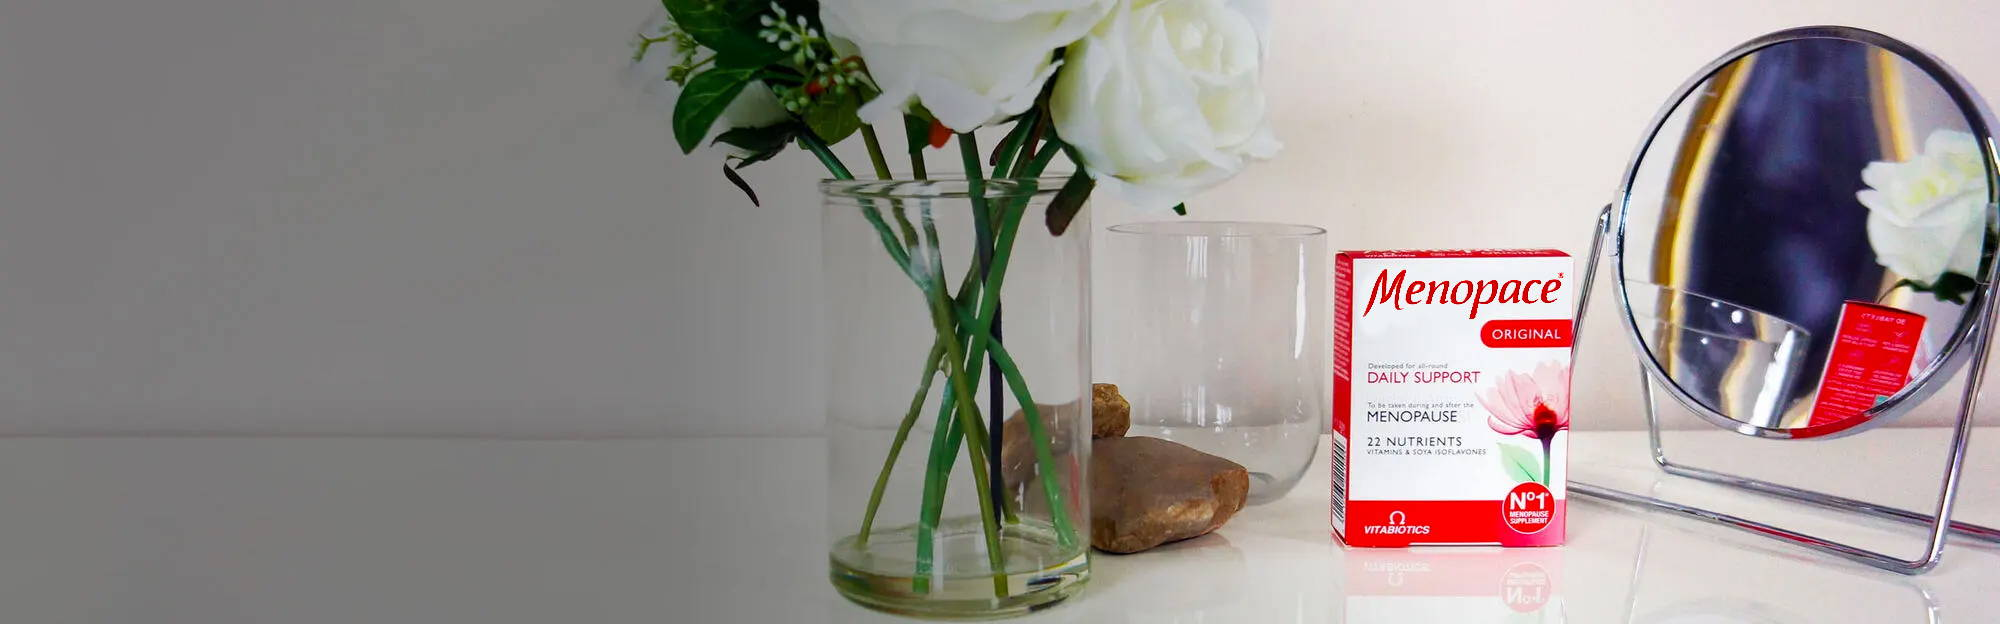 Menopace Original On Dressing Table